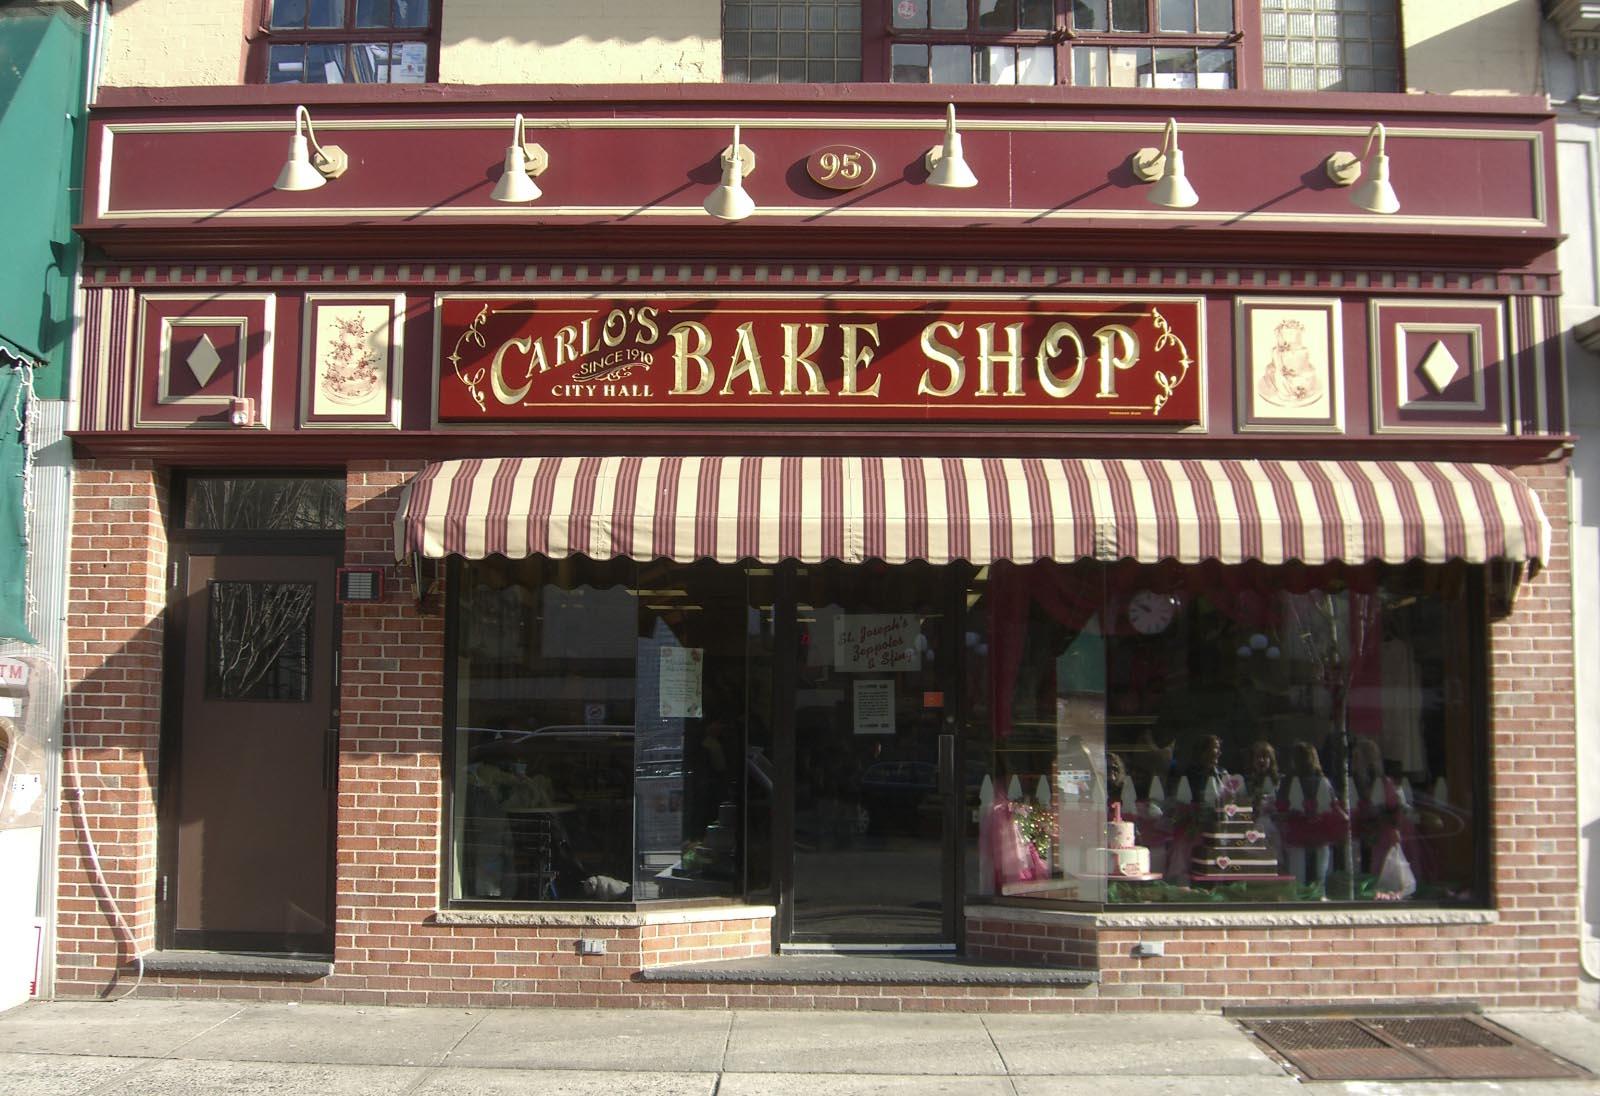 Carlo's Bake Shop in Hoboken, New Jersey, where the series is filmed ...